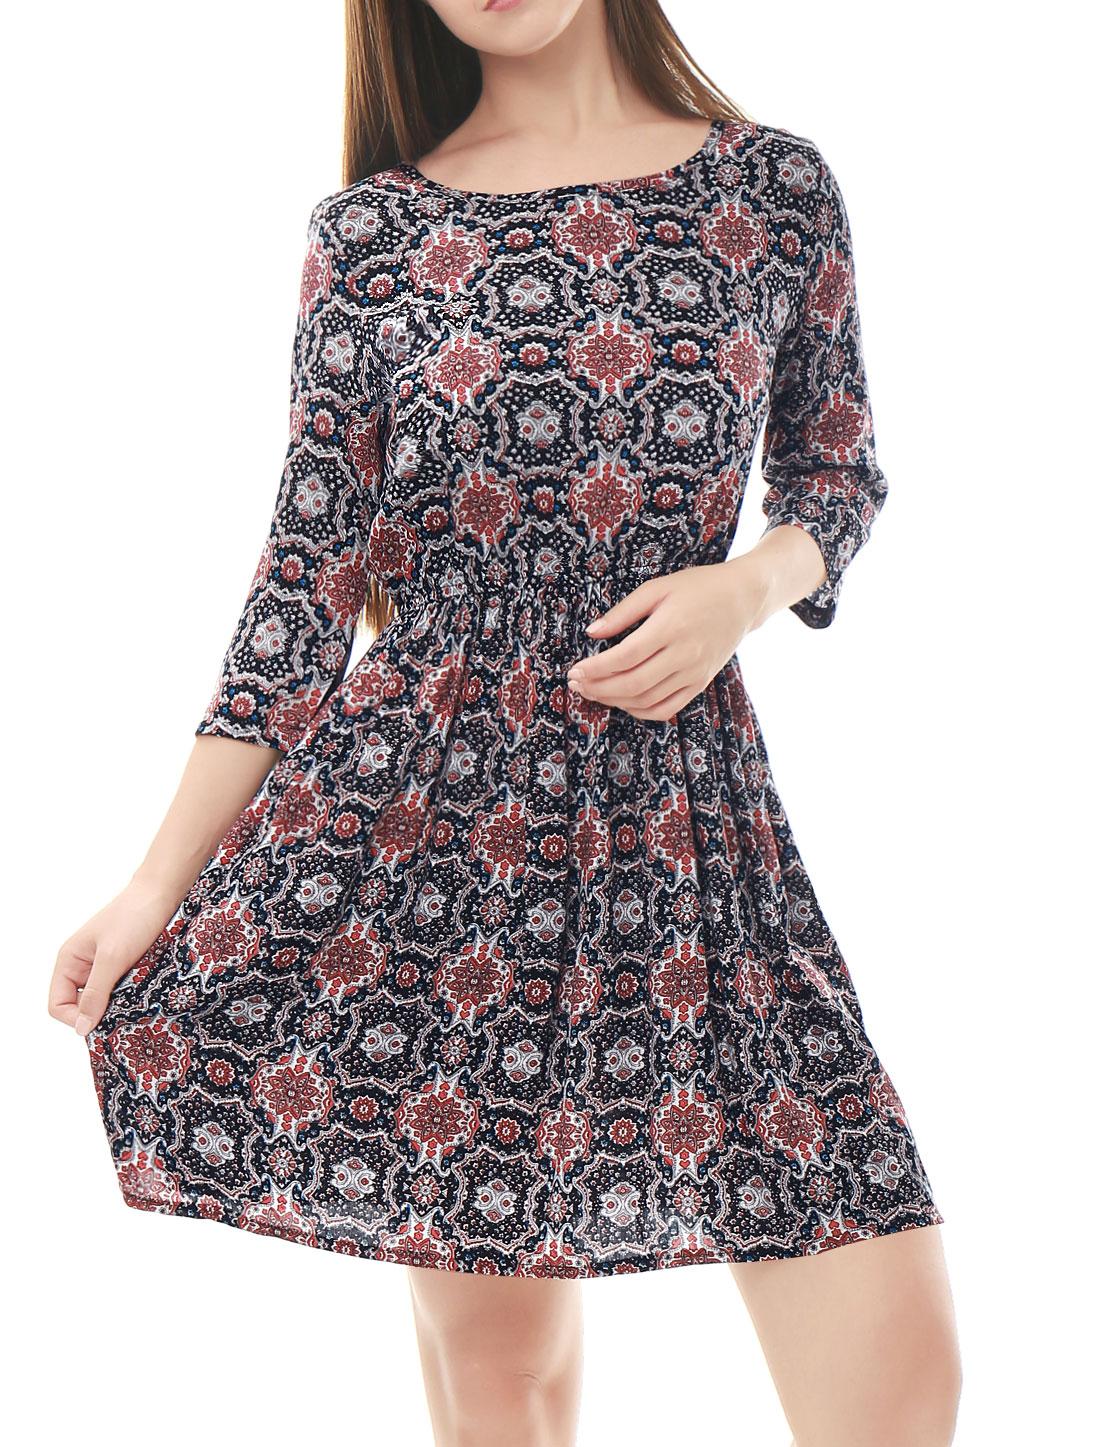 Woman Floral Prints 3/4 Sleeves Elastic Waist A Line Dress Black M